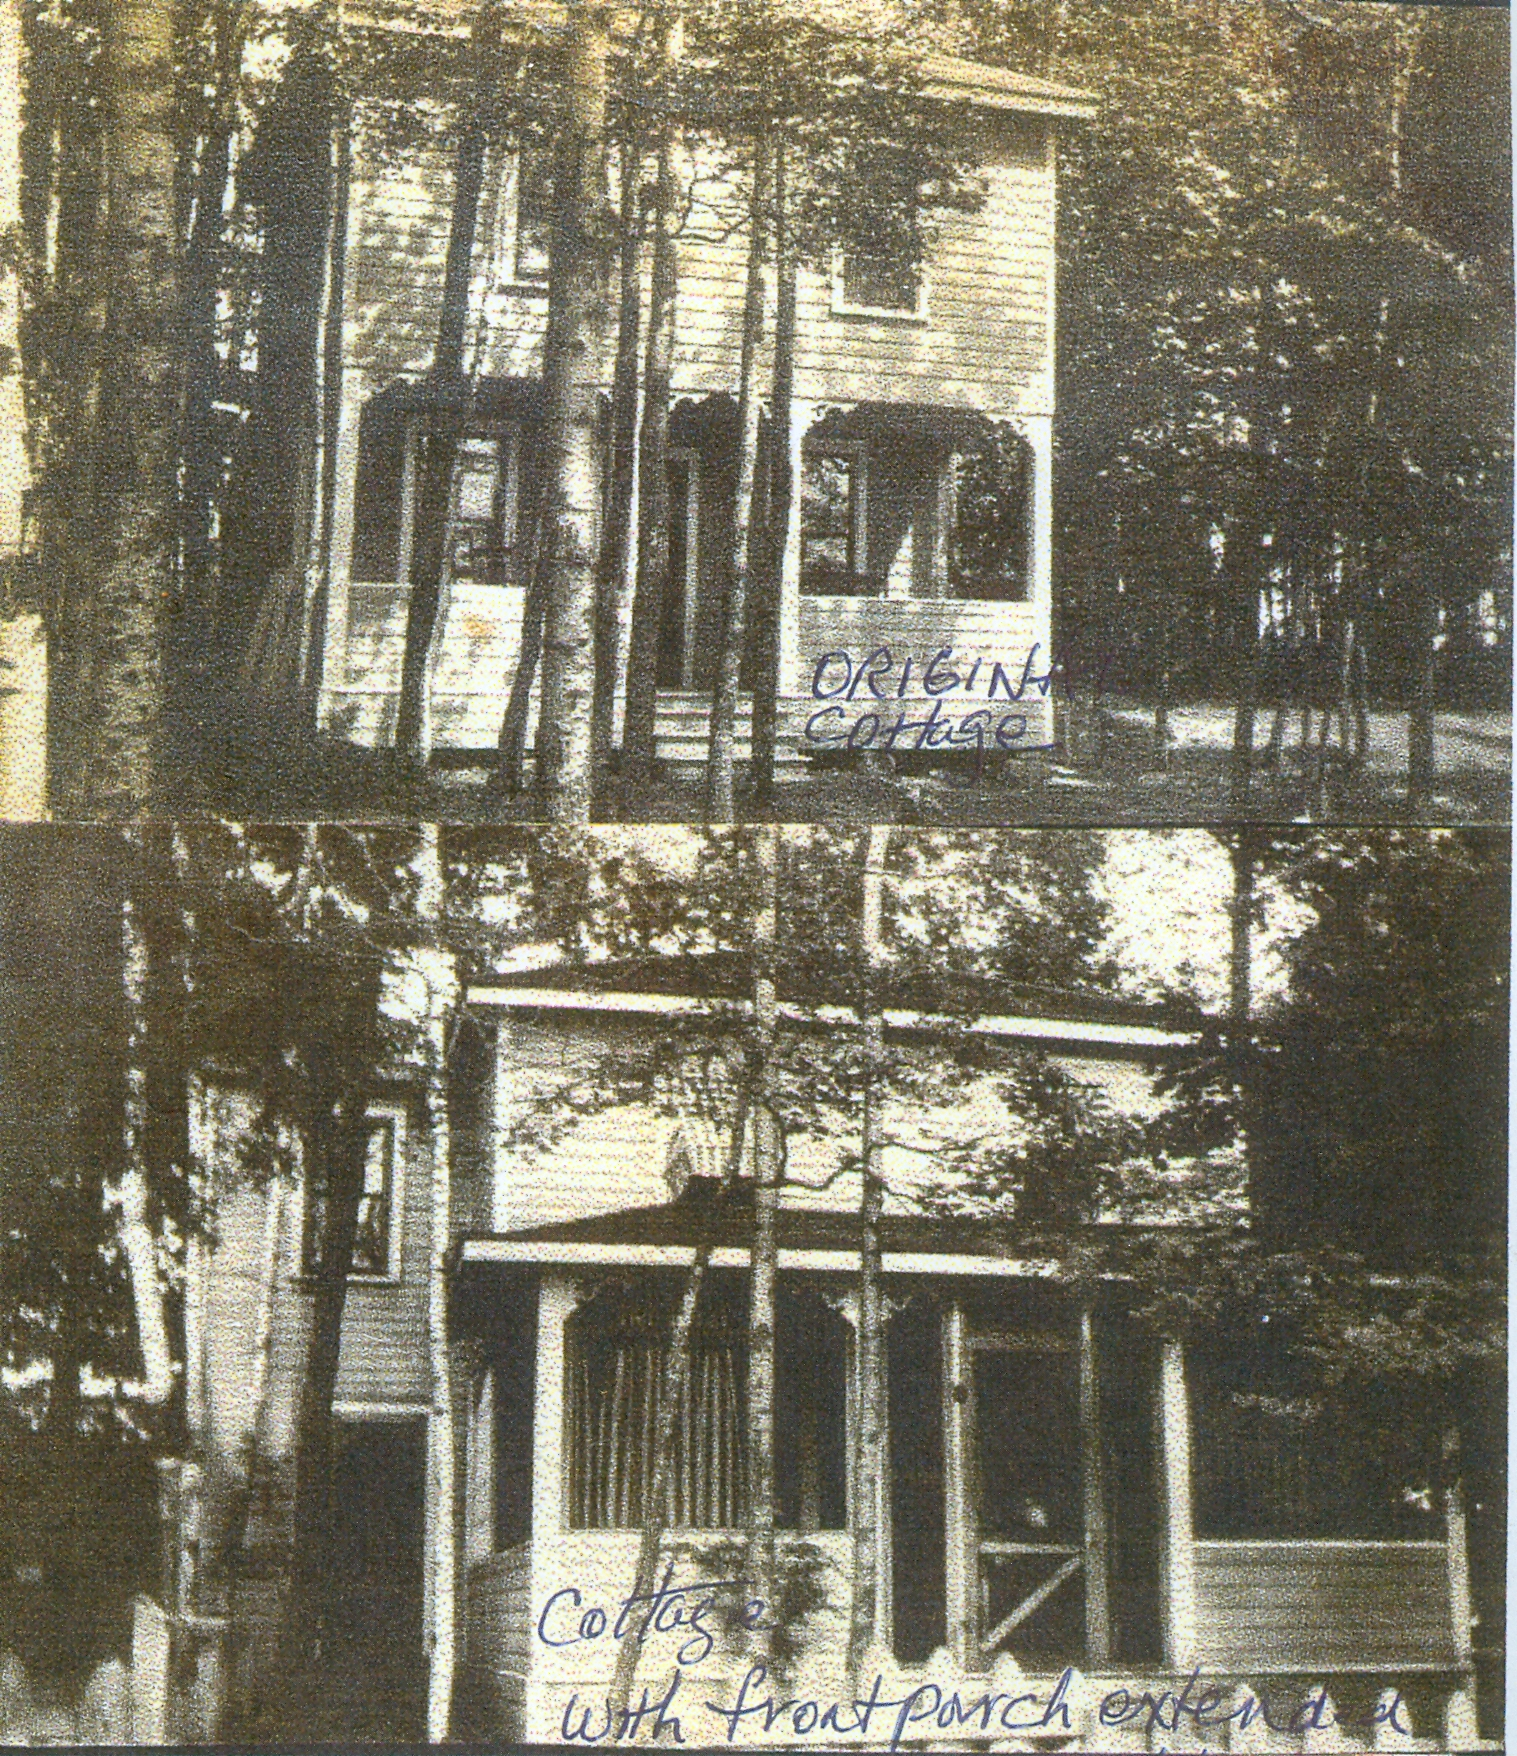 Pink Palace Morris Cottage, Original building